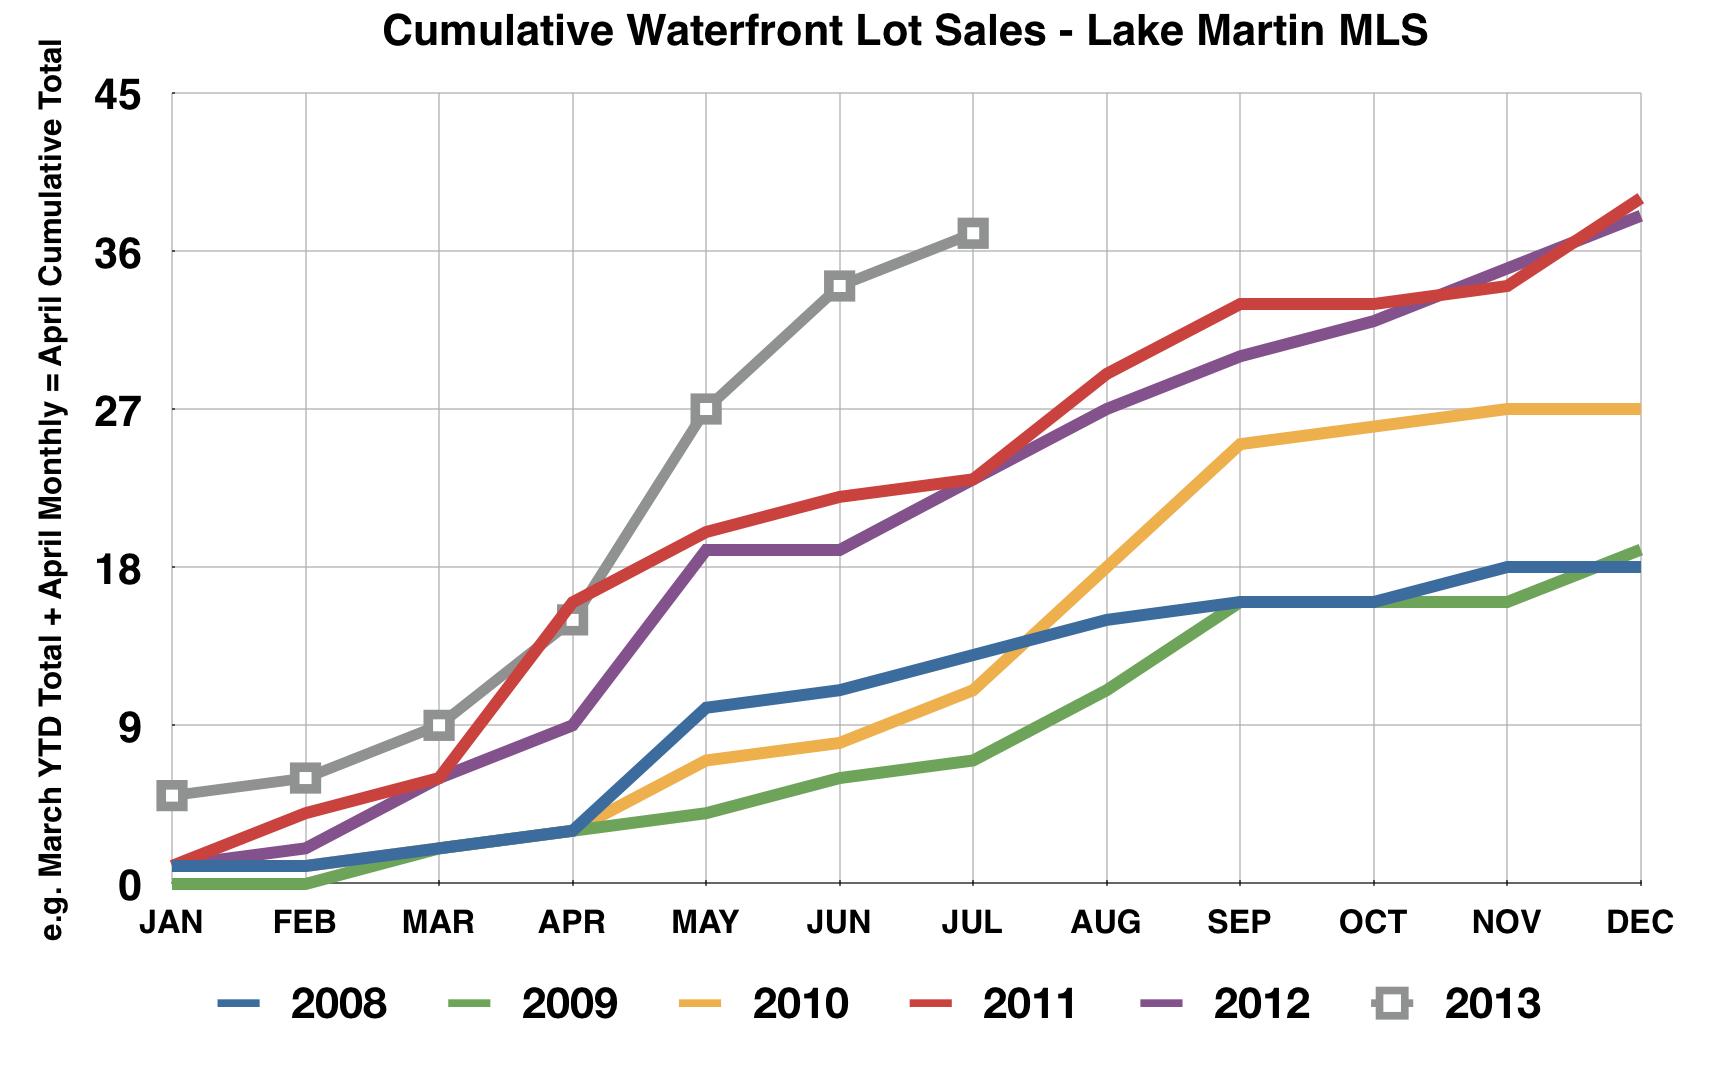 Lake Martin waterfront lot sales 2013